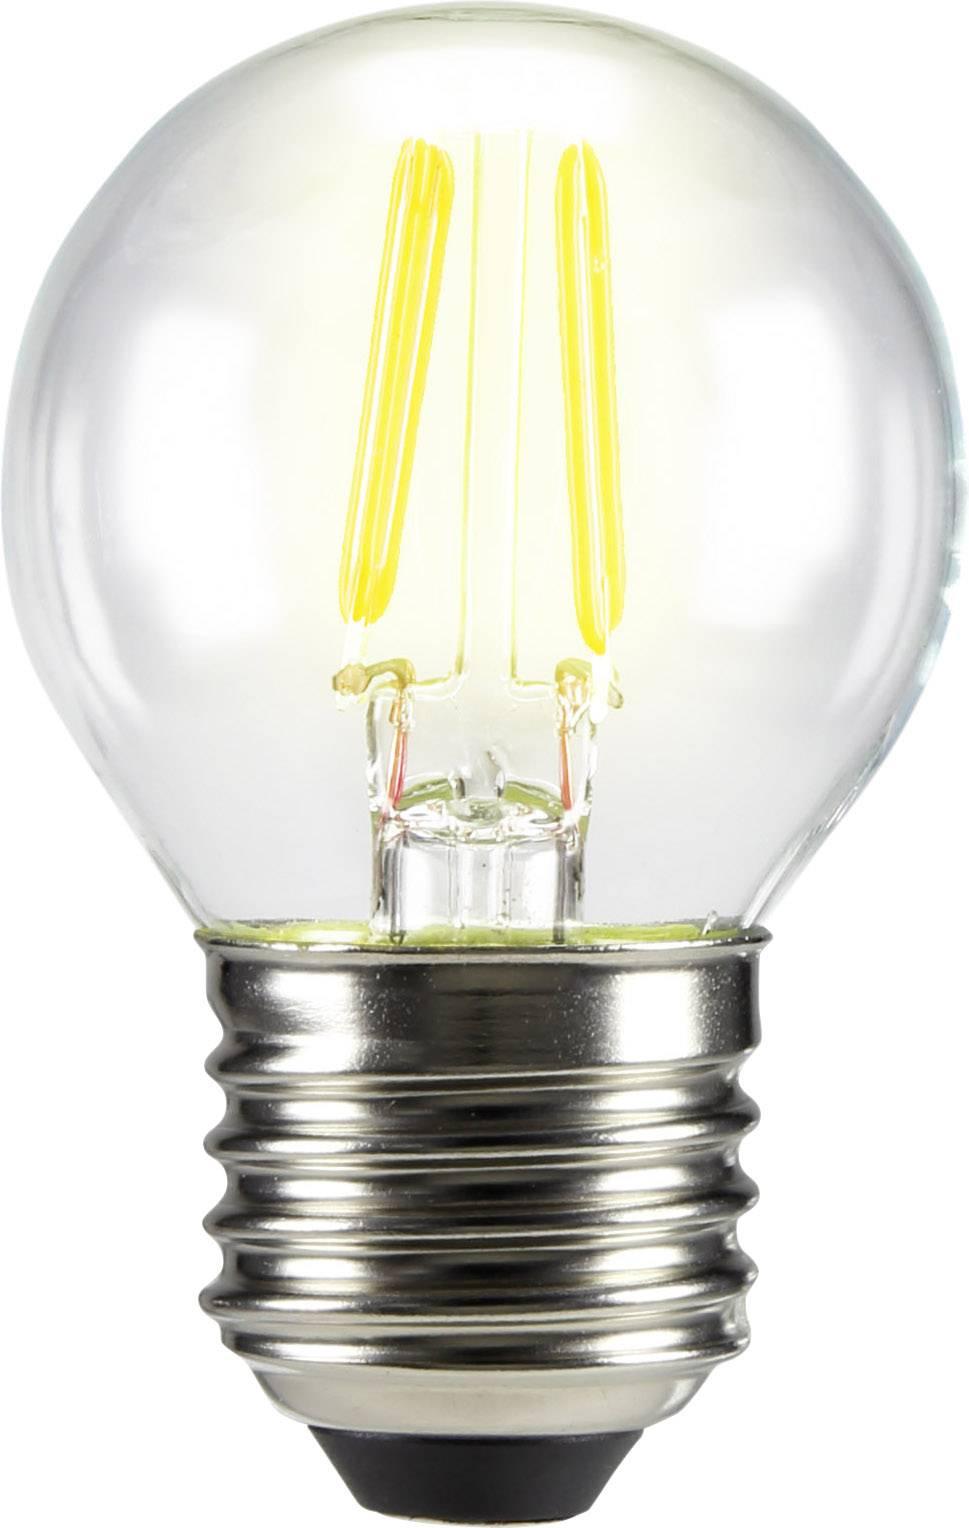 LED žiarovka 72 mm sygonix 230 V 3 W = 28 W vlákno 1 ks